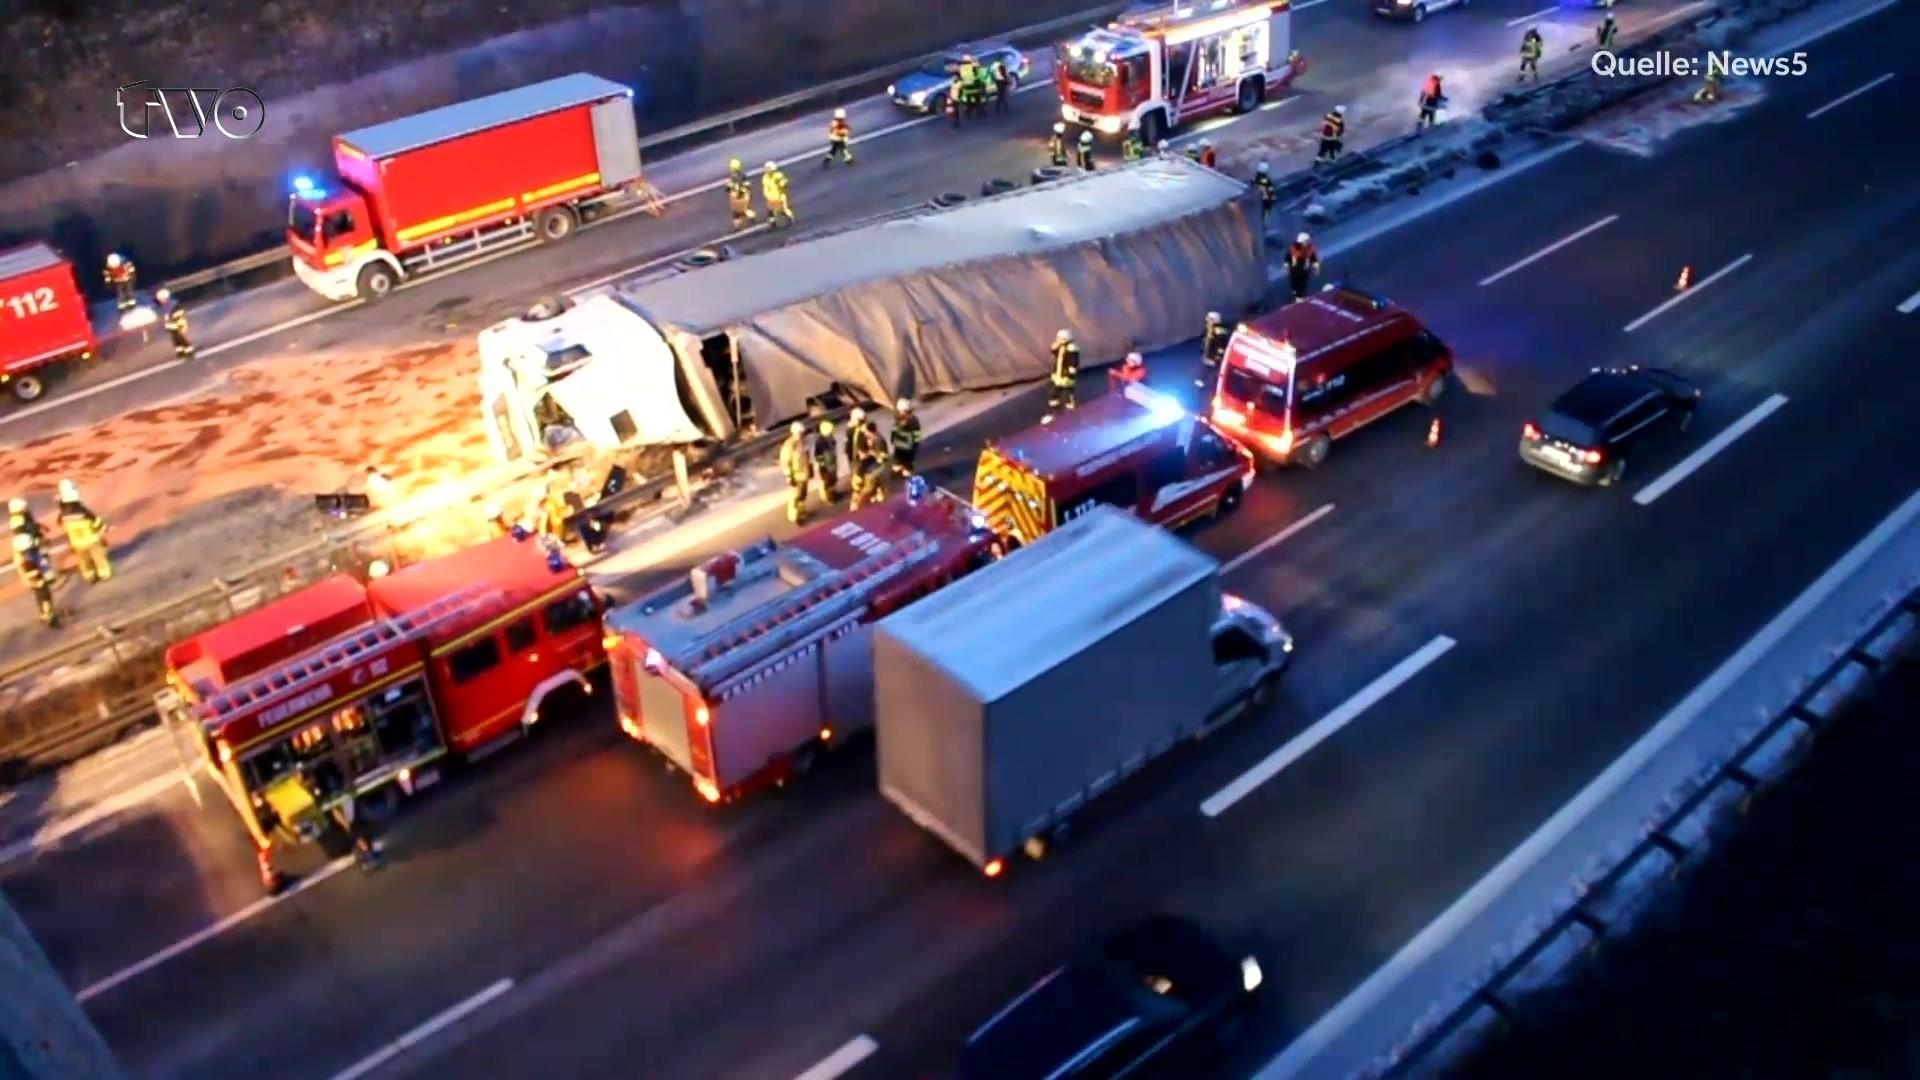 Autobahn A9 Tödlicher Unfall Am Autobahnkreuz Bayreuth Kulmbach